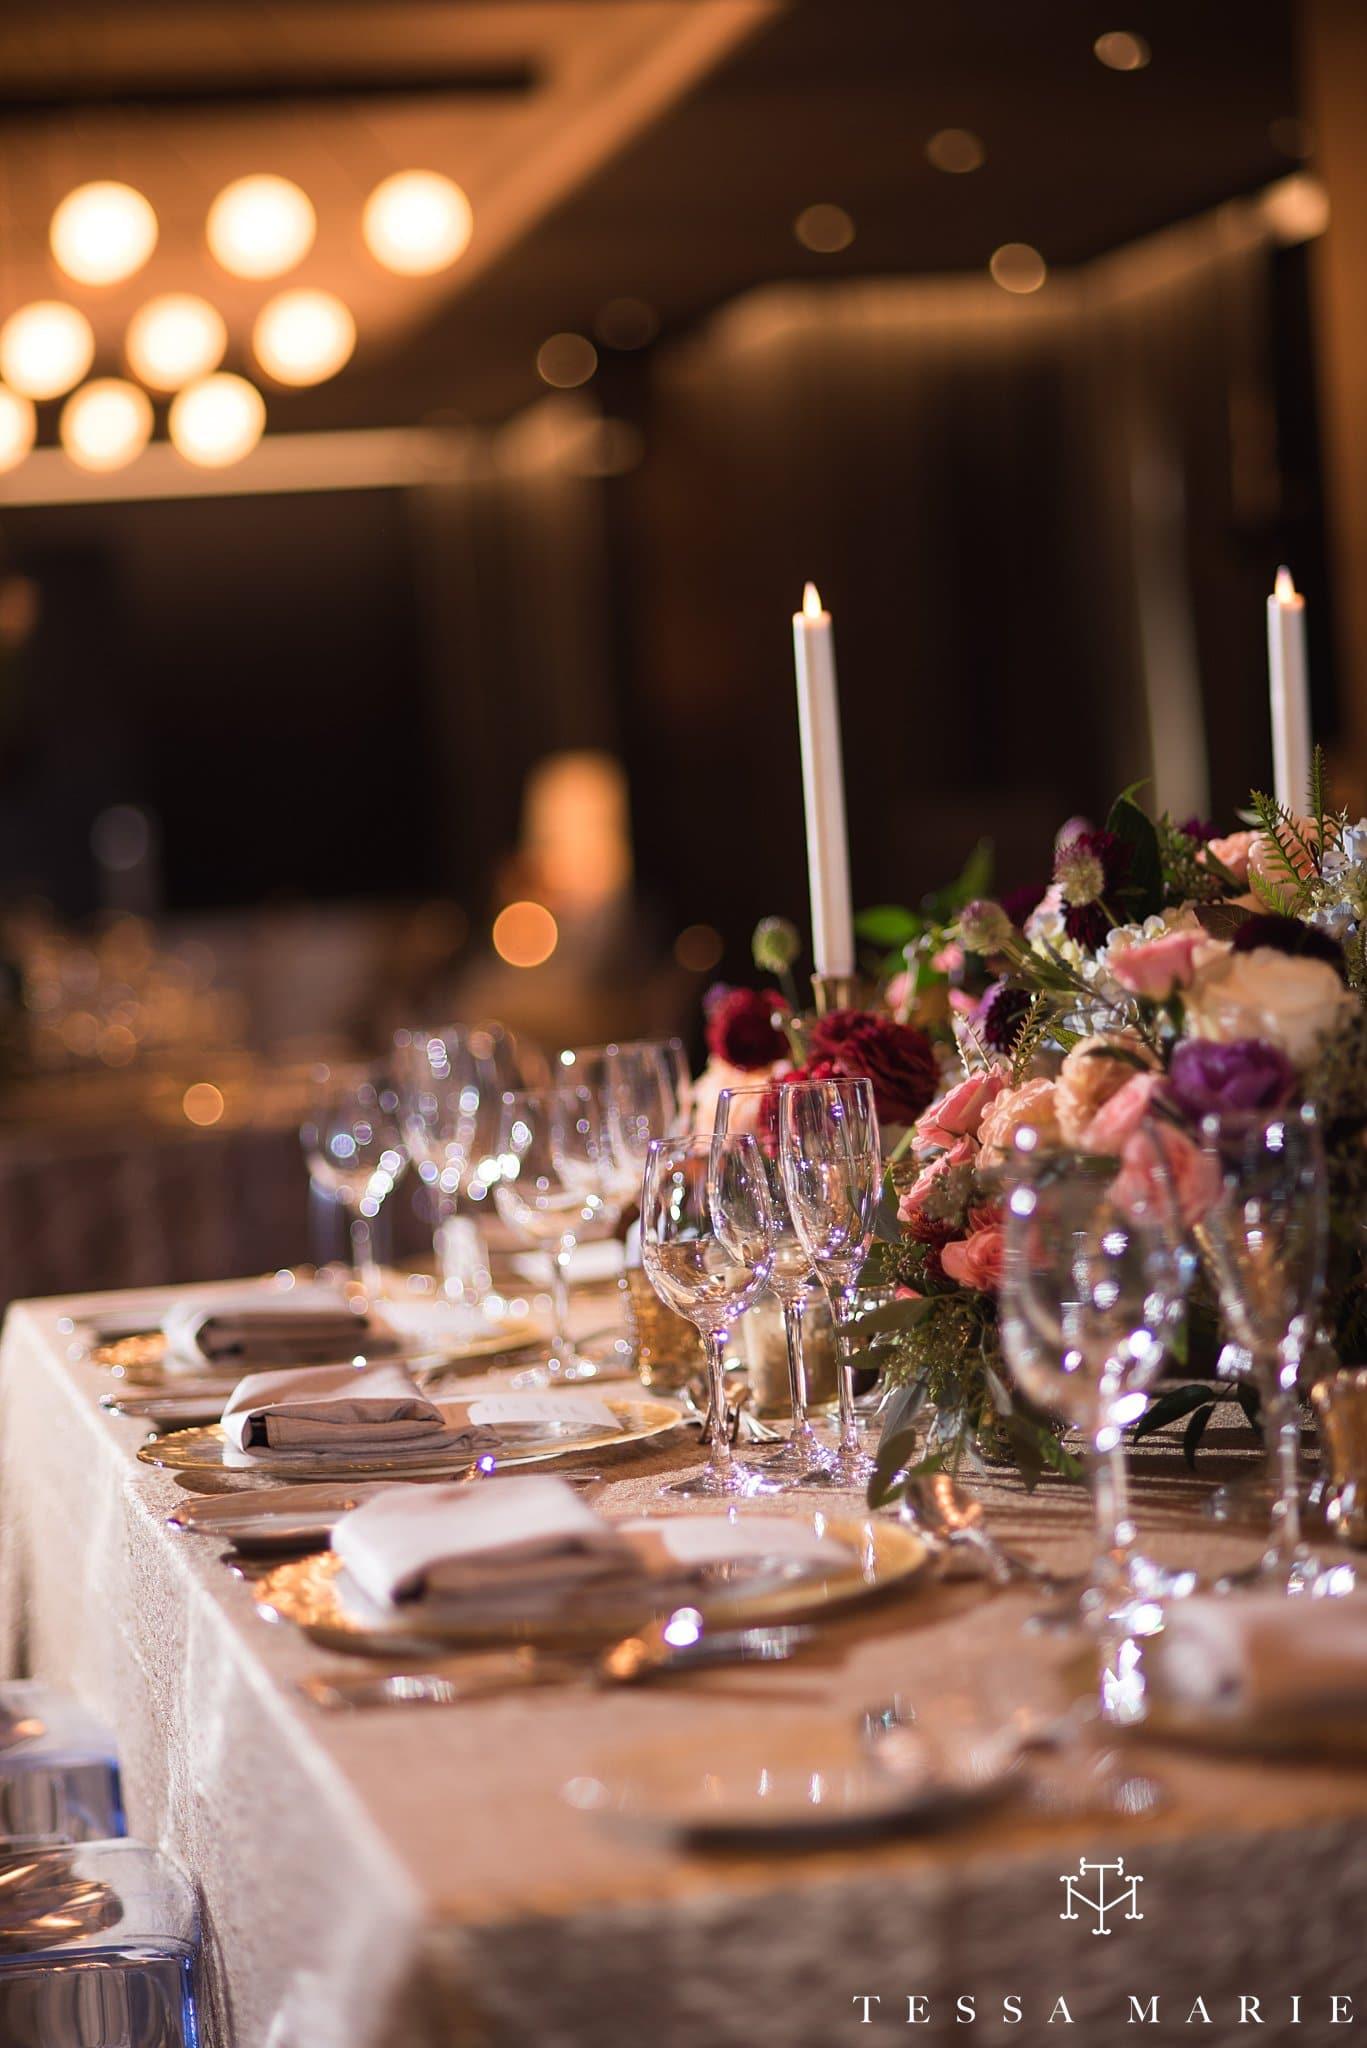 tessa_marie_Weddings_four_seasons_rehersal_dinner_pictures_wedding_atlanta_wedding_getting_married_0009.jpg